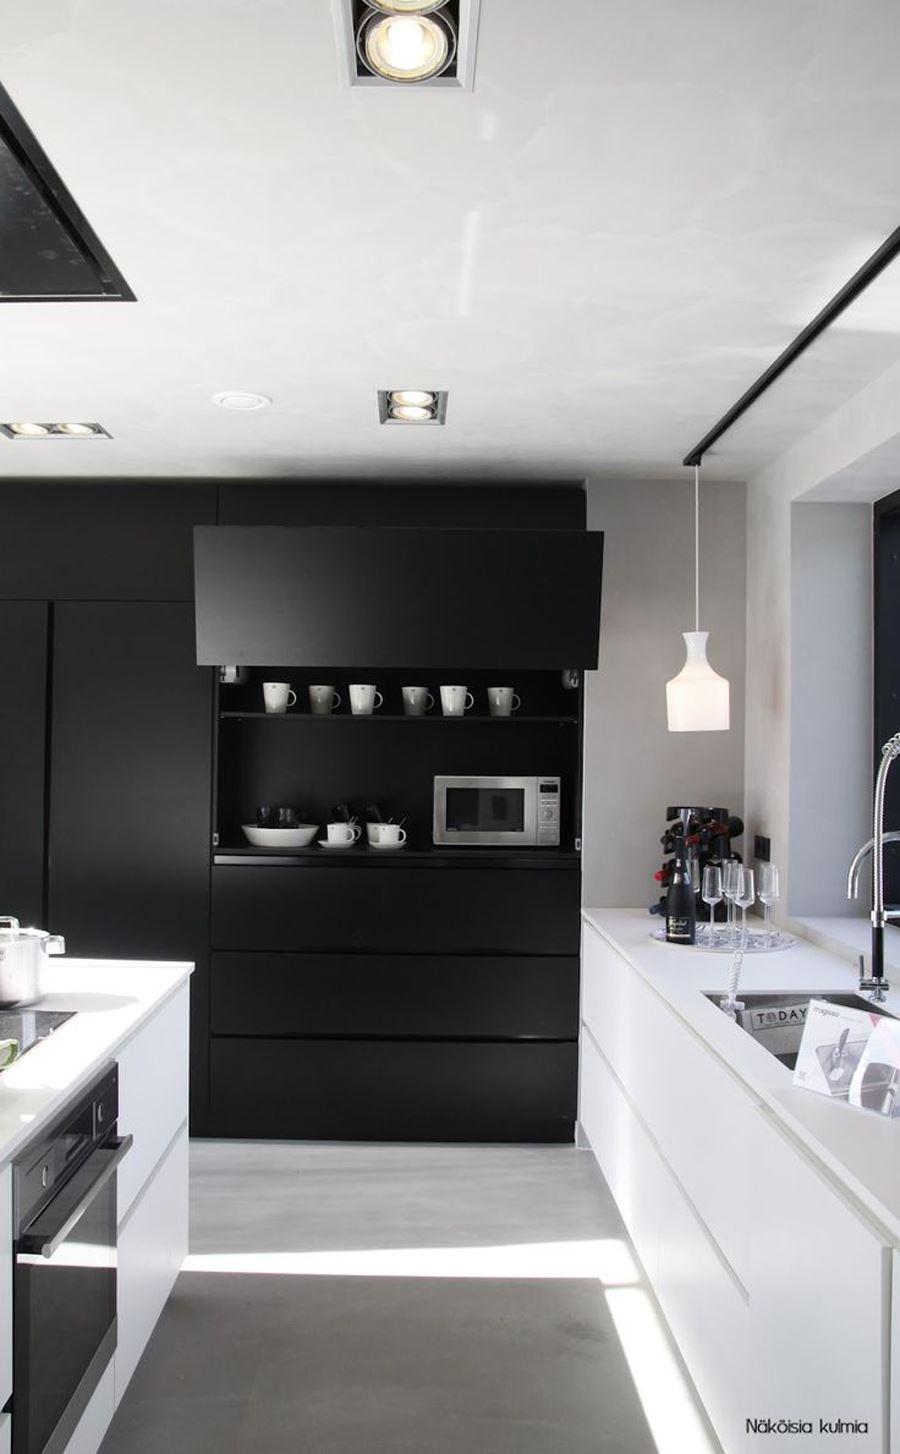 Sihay Beyaz Mobilyalı Siyah beyaz mutfak